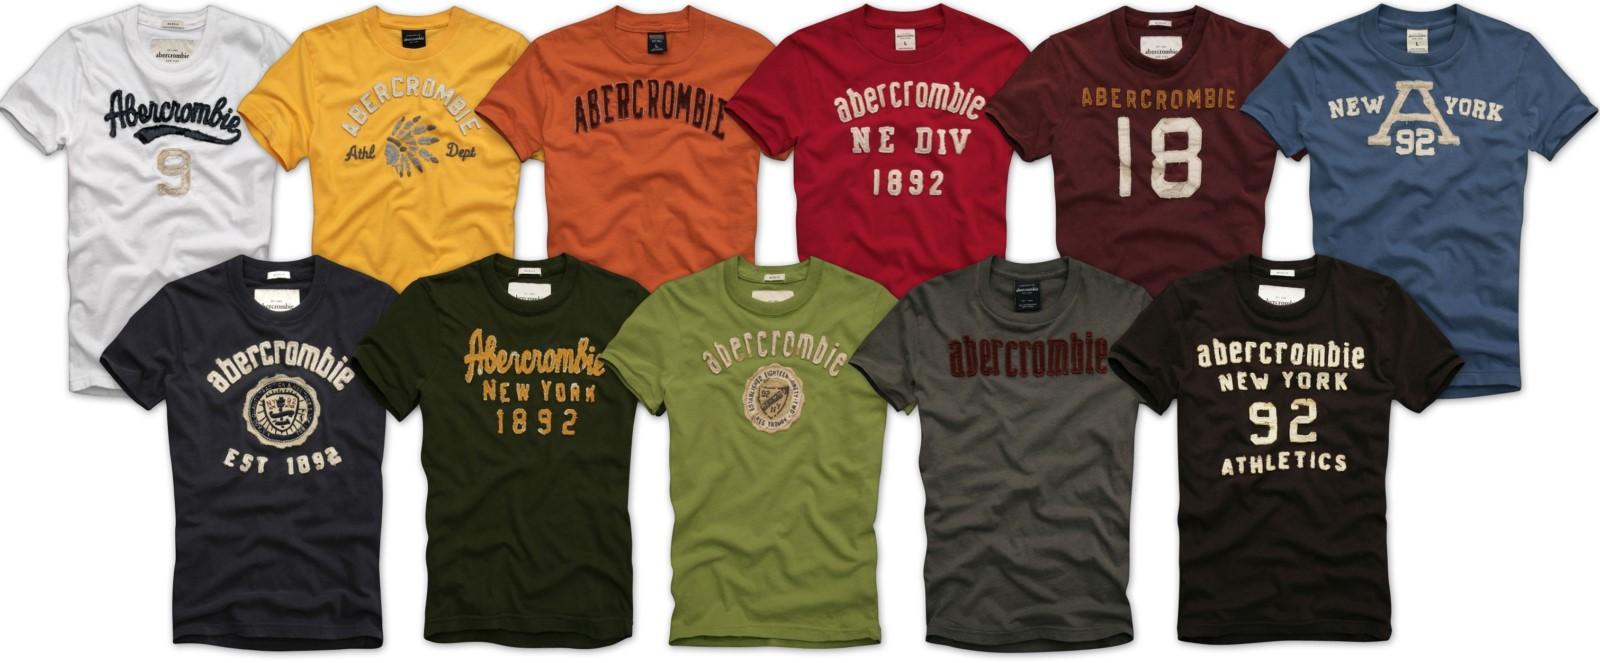 Abercrombie   Fitch Co. Ropa de Segunda Mano como nueva. Comprar camisetas  ... b817bb06b8417